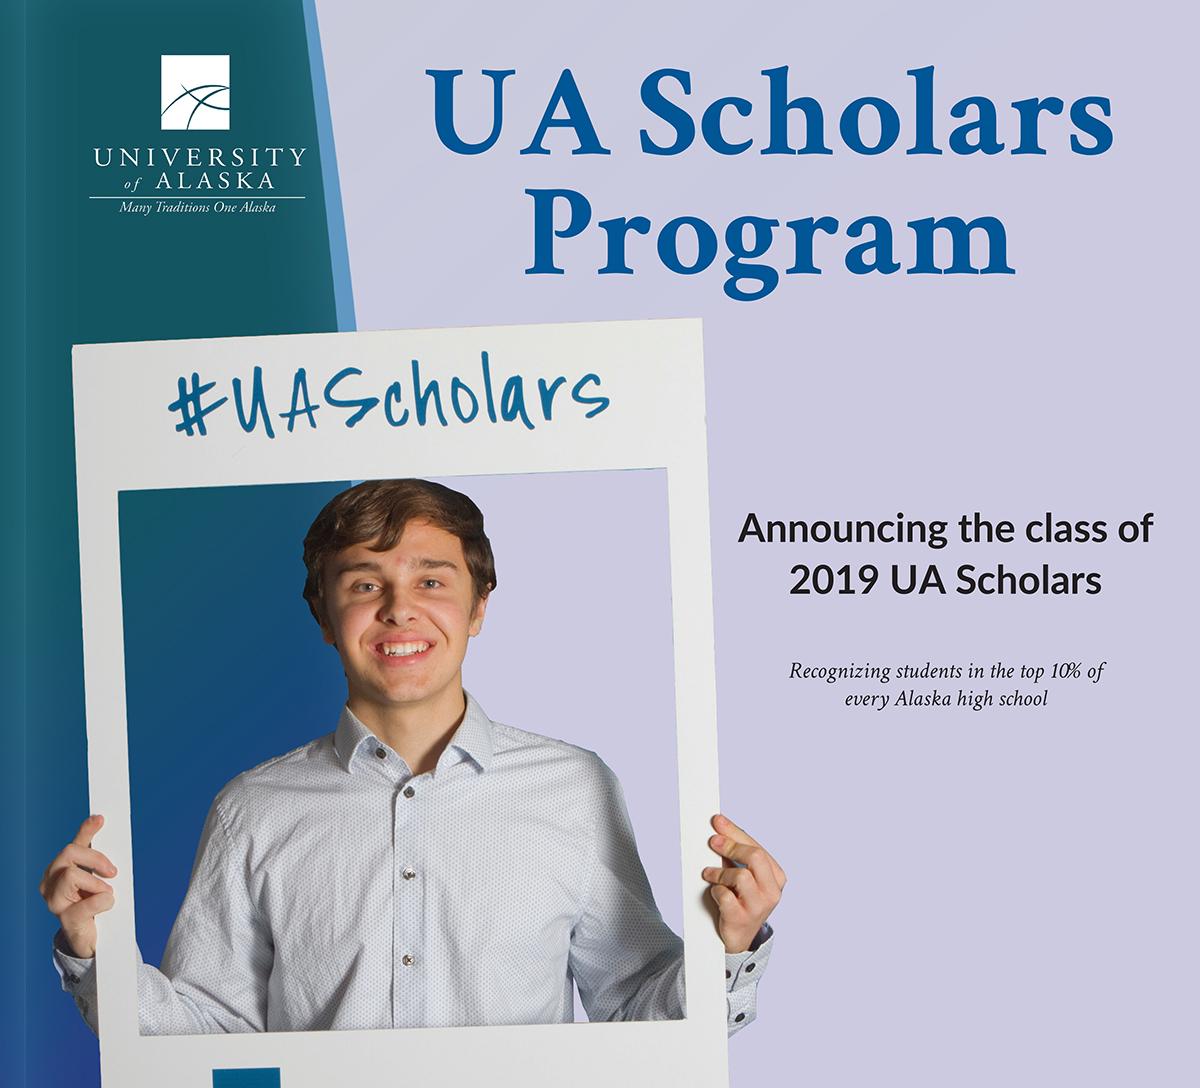 UA Scholars